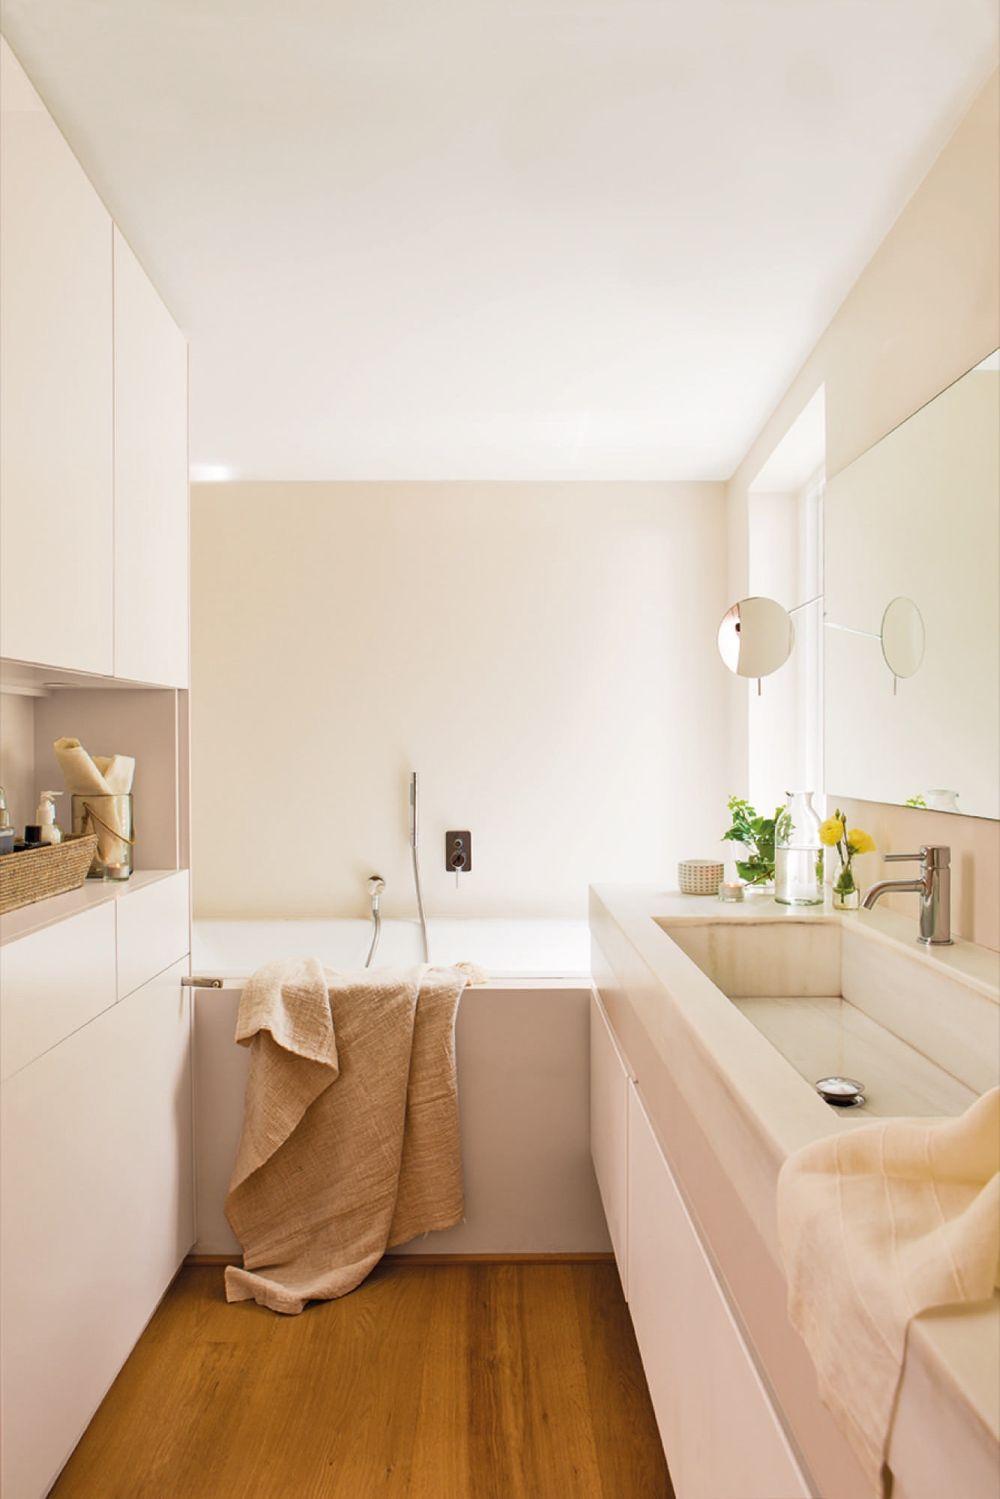 adelaparvu.com despre casa cu gradina, accente marine, designer Jeanette Dresing, Foto Feran Freixa (24)